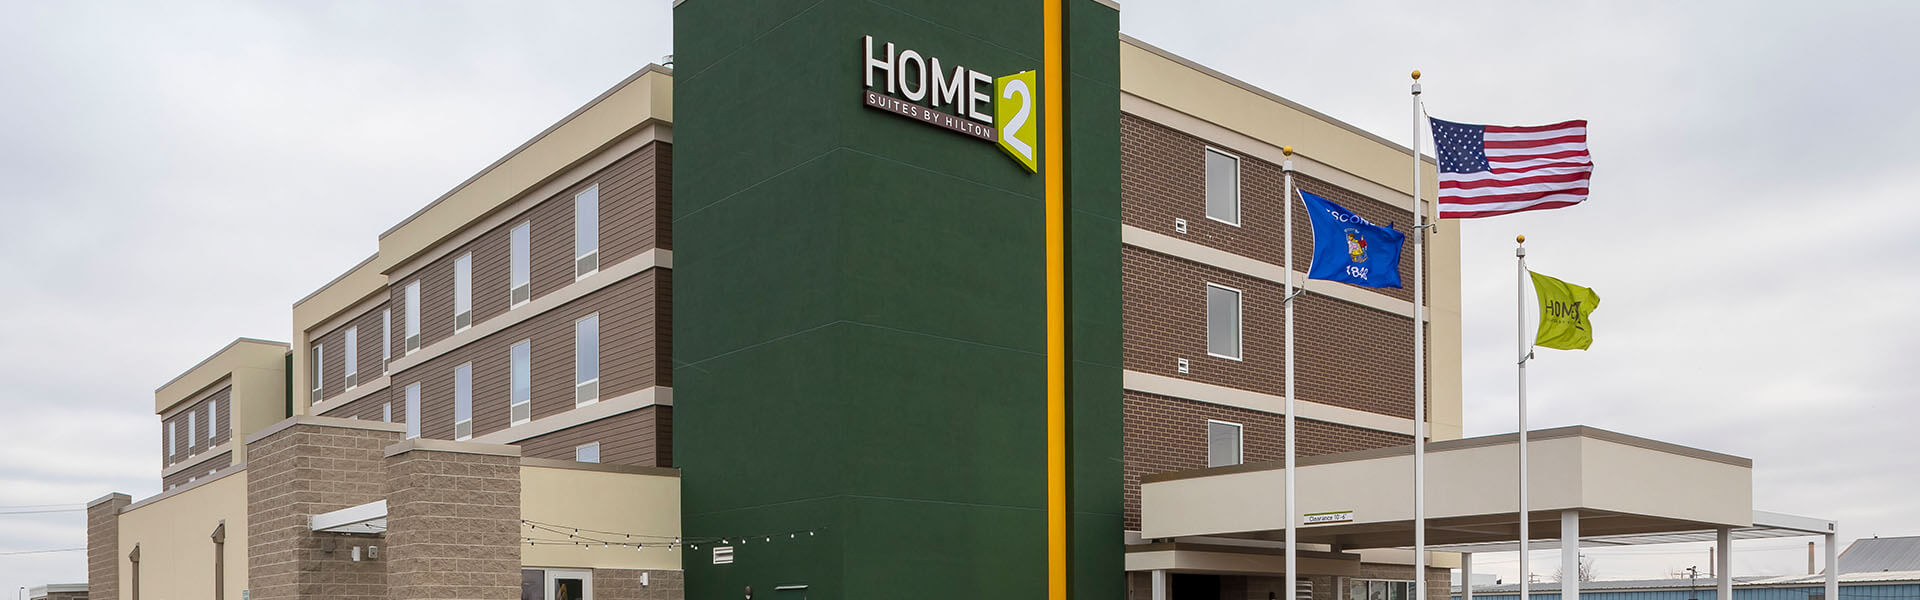 immel-banner_HIlton Home 2 Suites